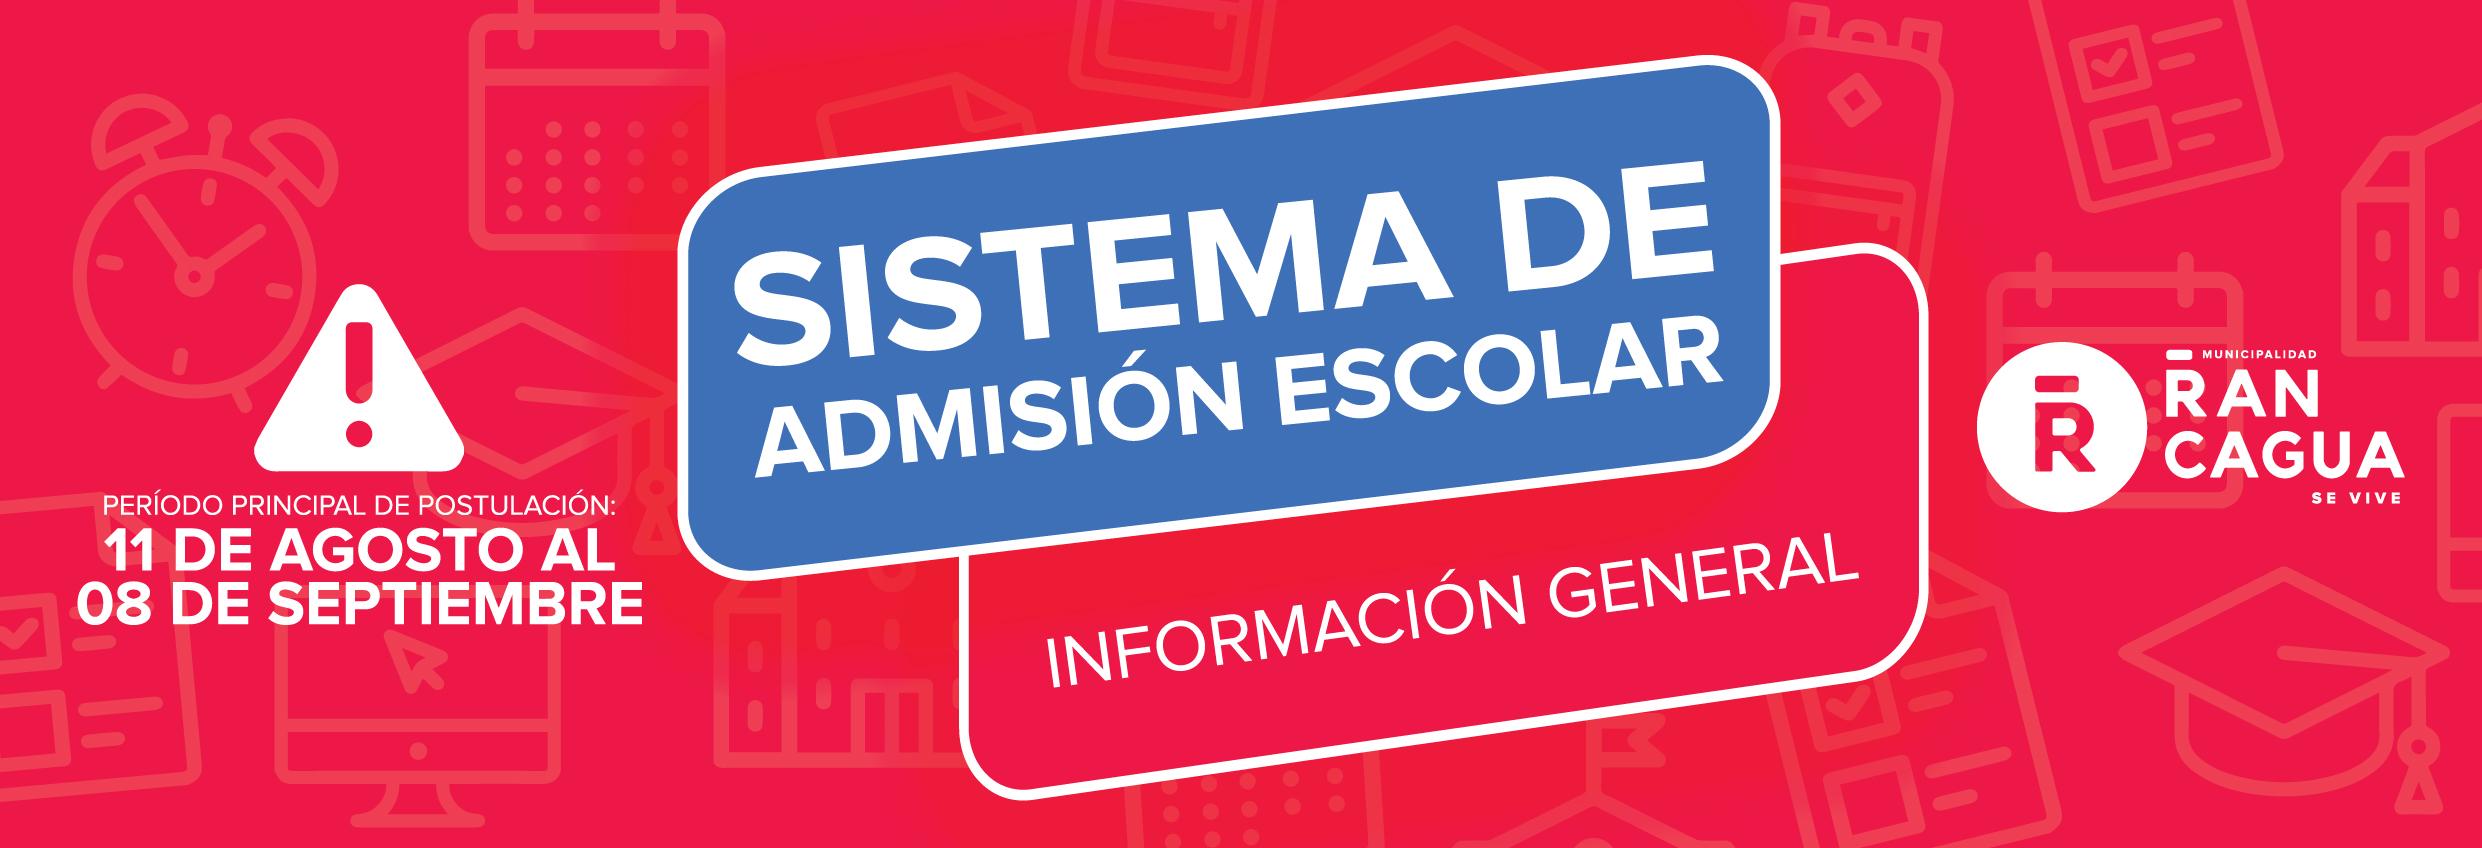 SISTEMA DE ADMISION ESCOLAR 2021